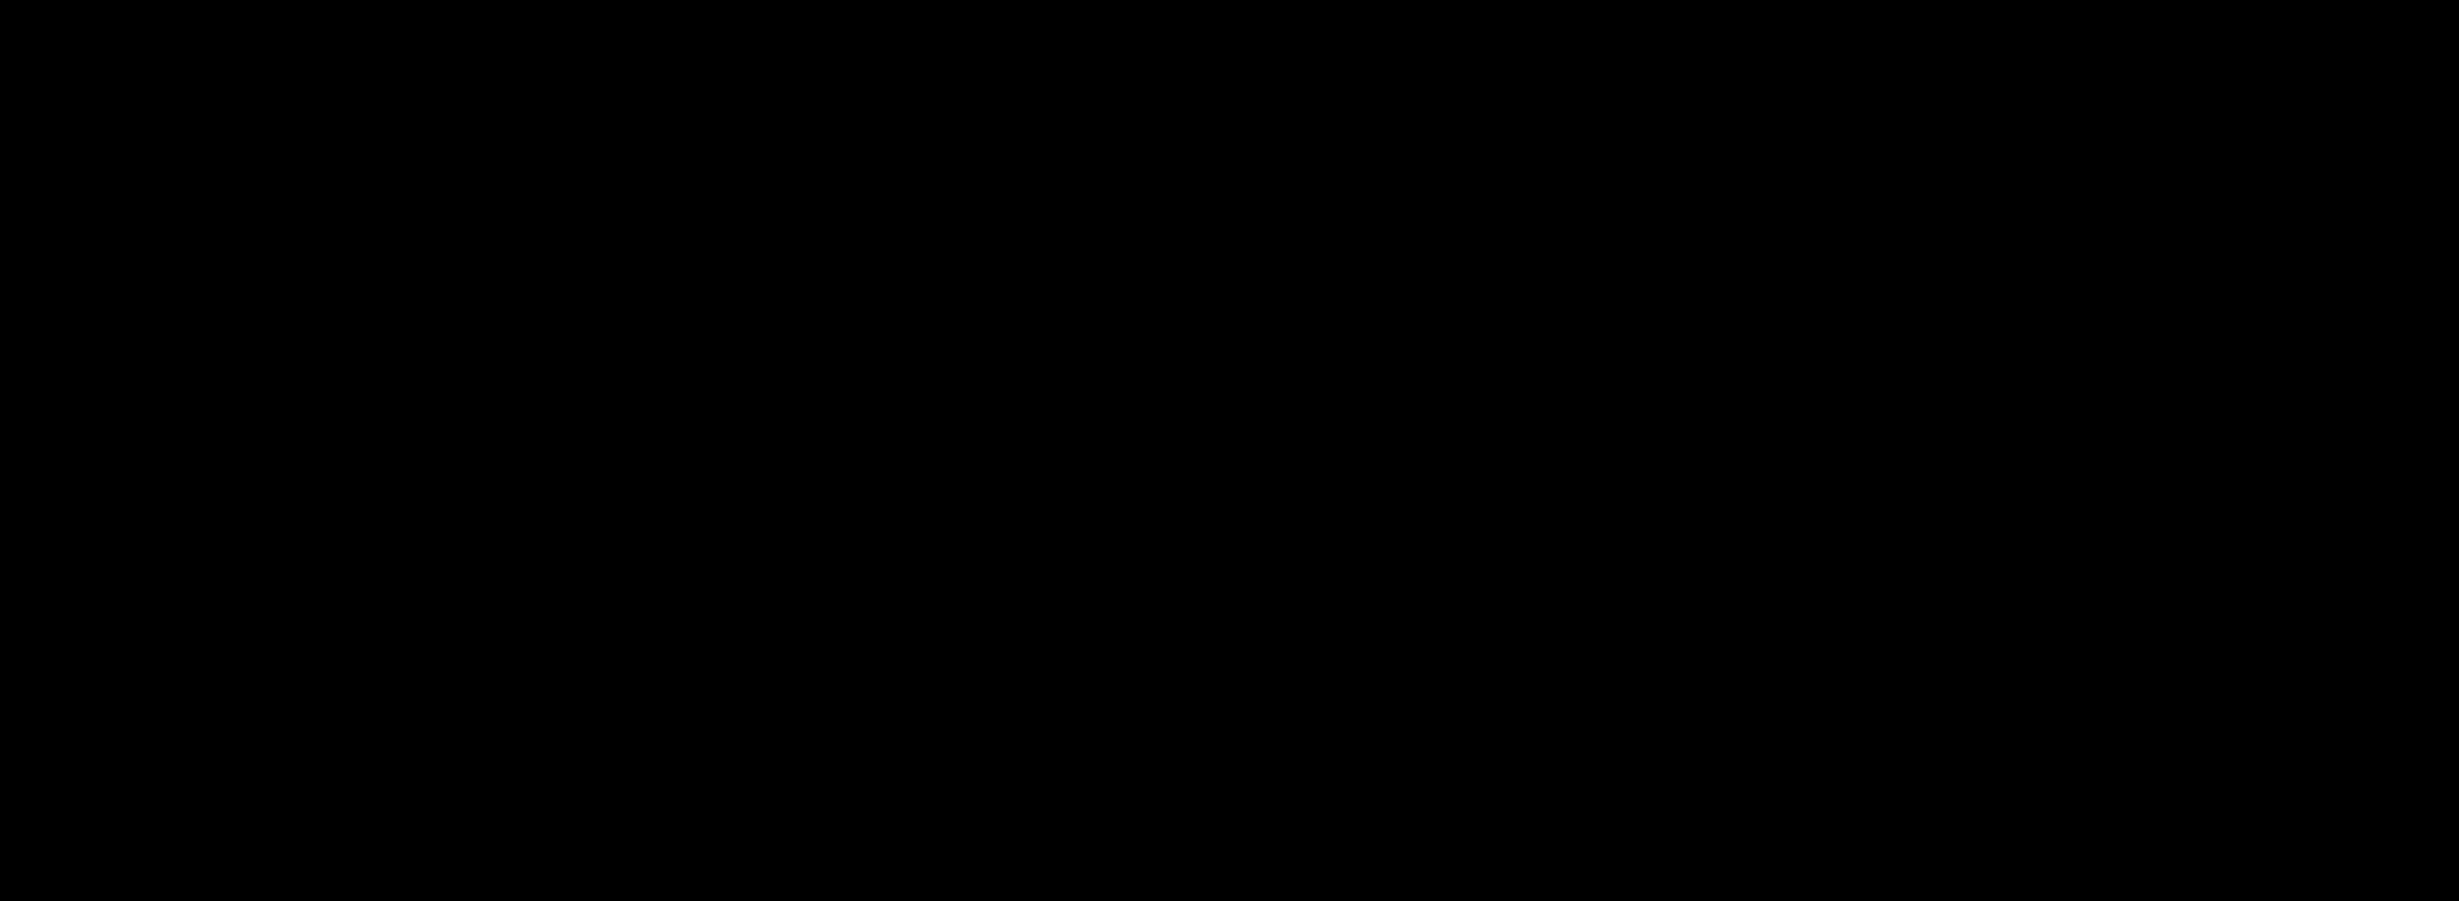 rac-1-Linoleoyl-3-linolenoyl-propanetriol